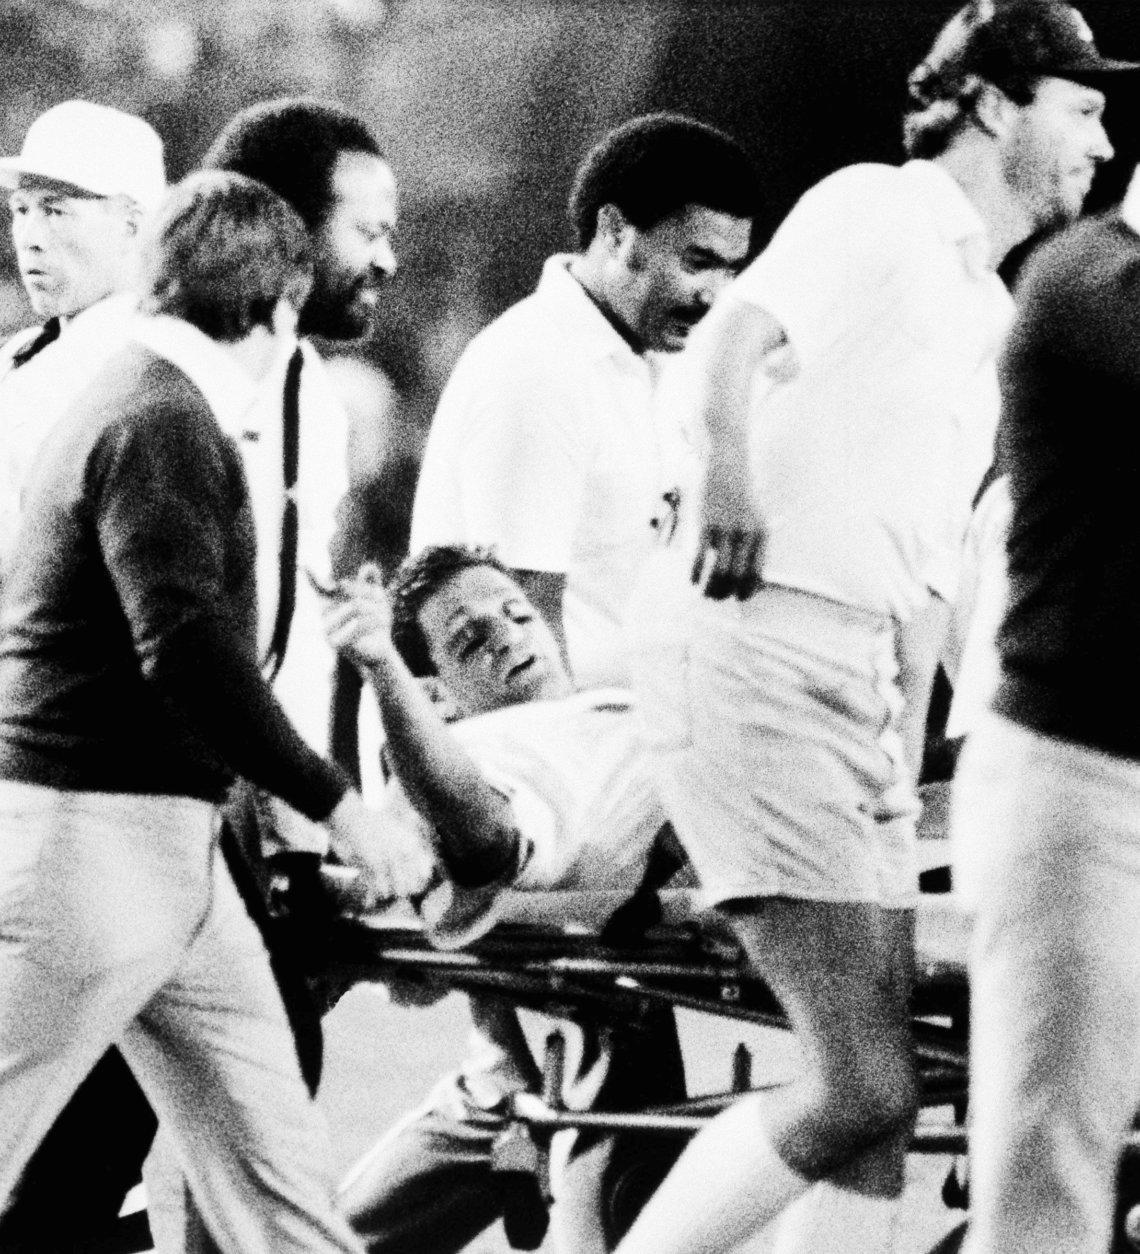 Washington Redskins quarterback Joe Theismann gestures as he is carried off the field at R.F.K. Stadium Monday night  Nov. 18, 1985 in Washington. Theismann injured his right leg during second quarter action. (AP Photo/J. Scott Applewhite)